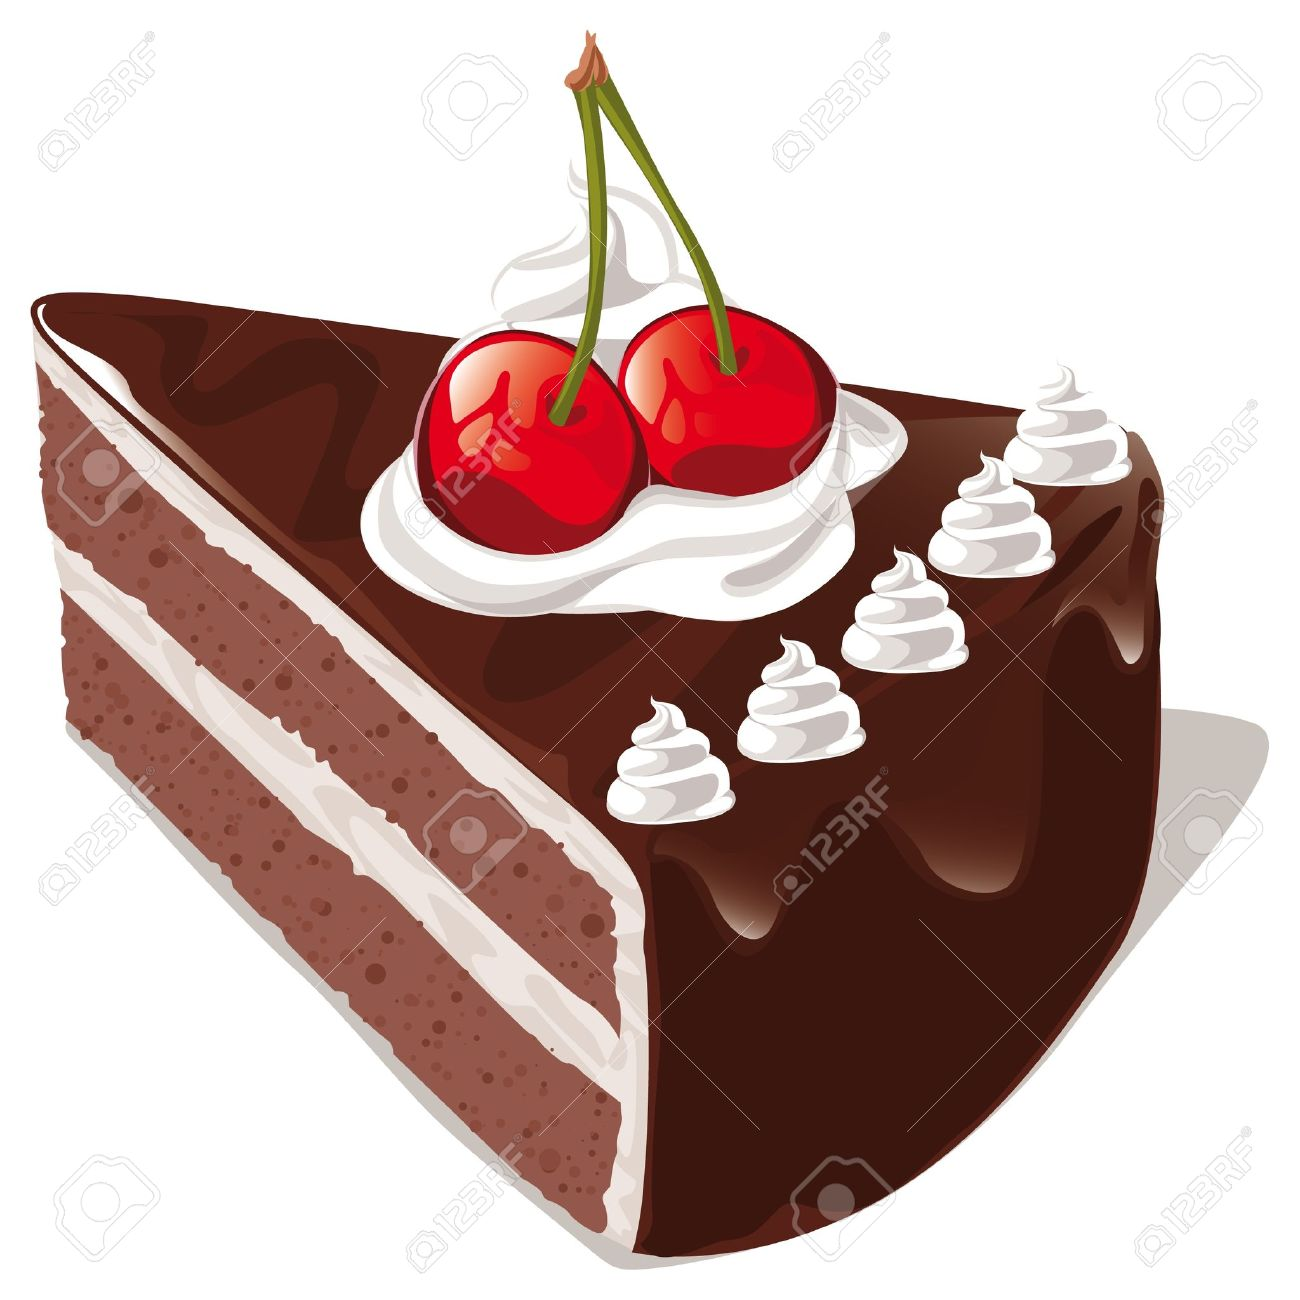 chocolate cake slice clipart  Clipground